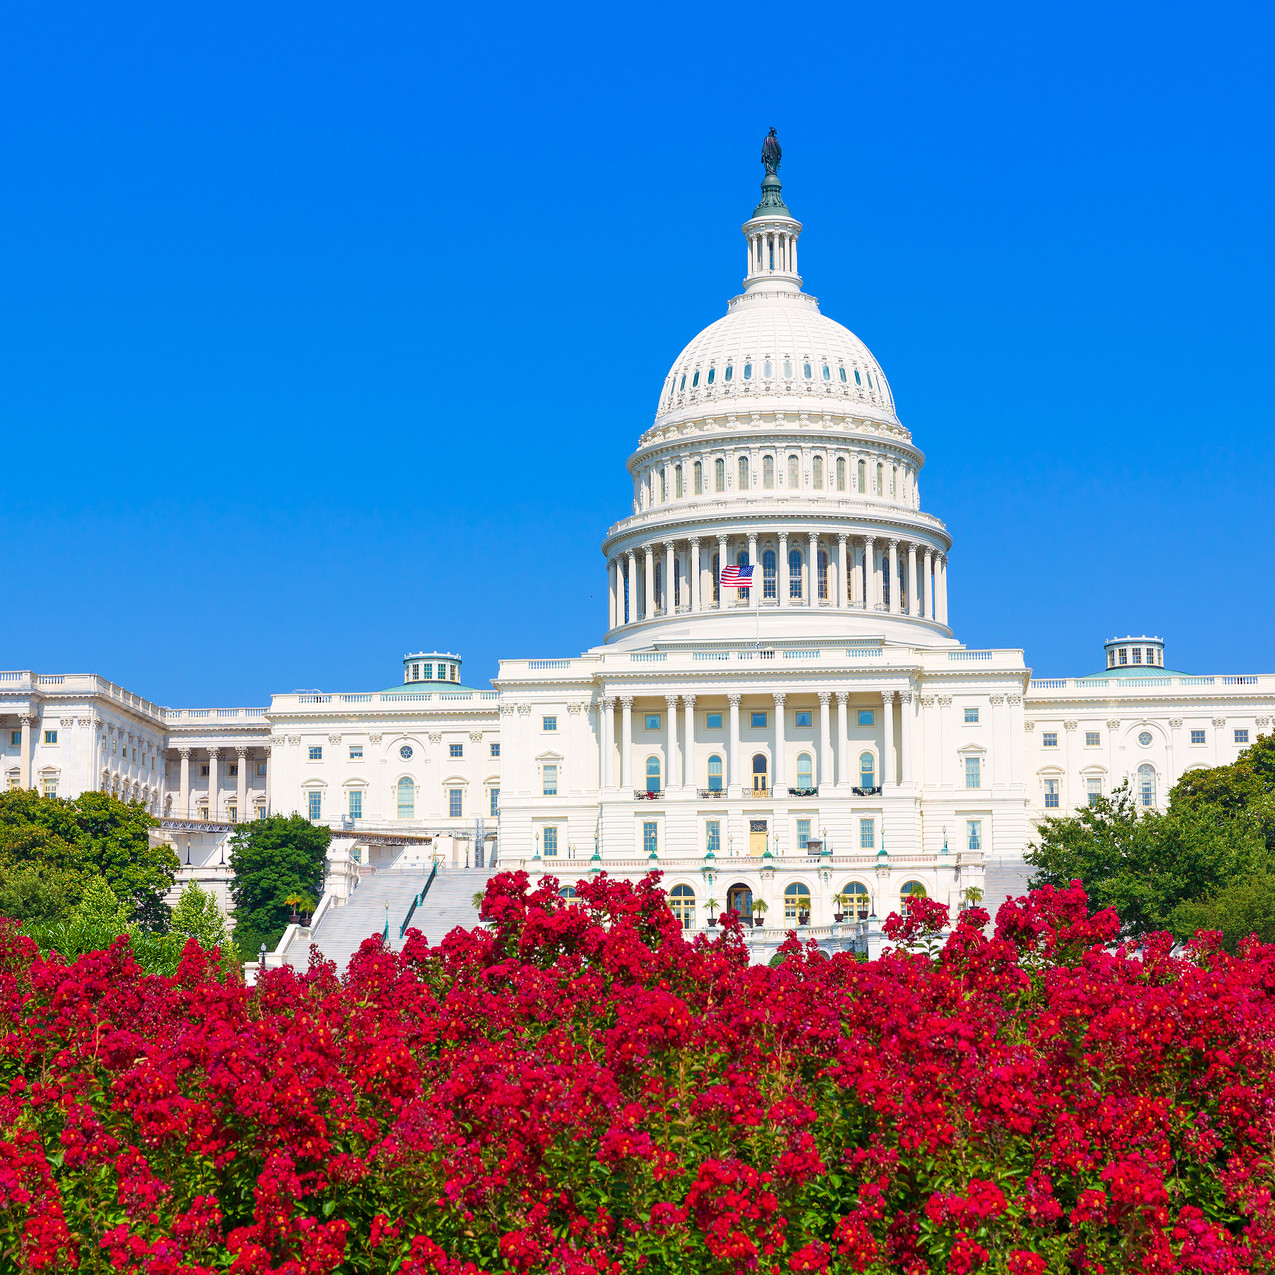 Capitol building Washington DC pink flowers garden USA congress US